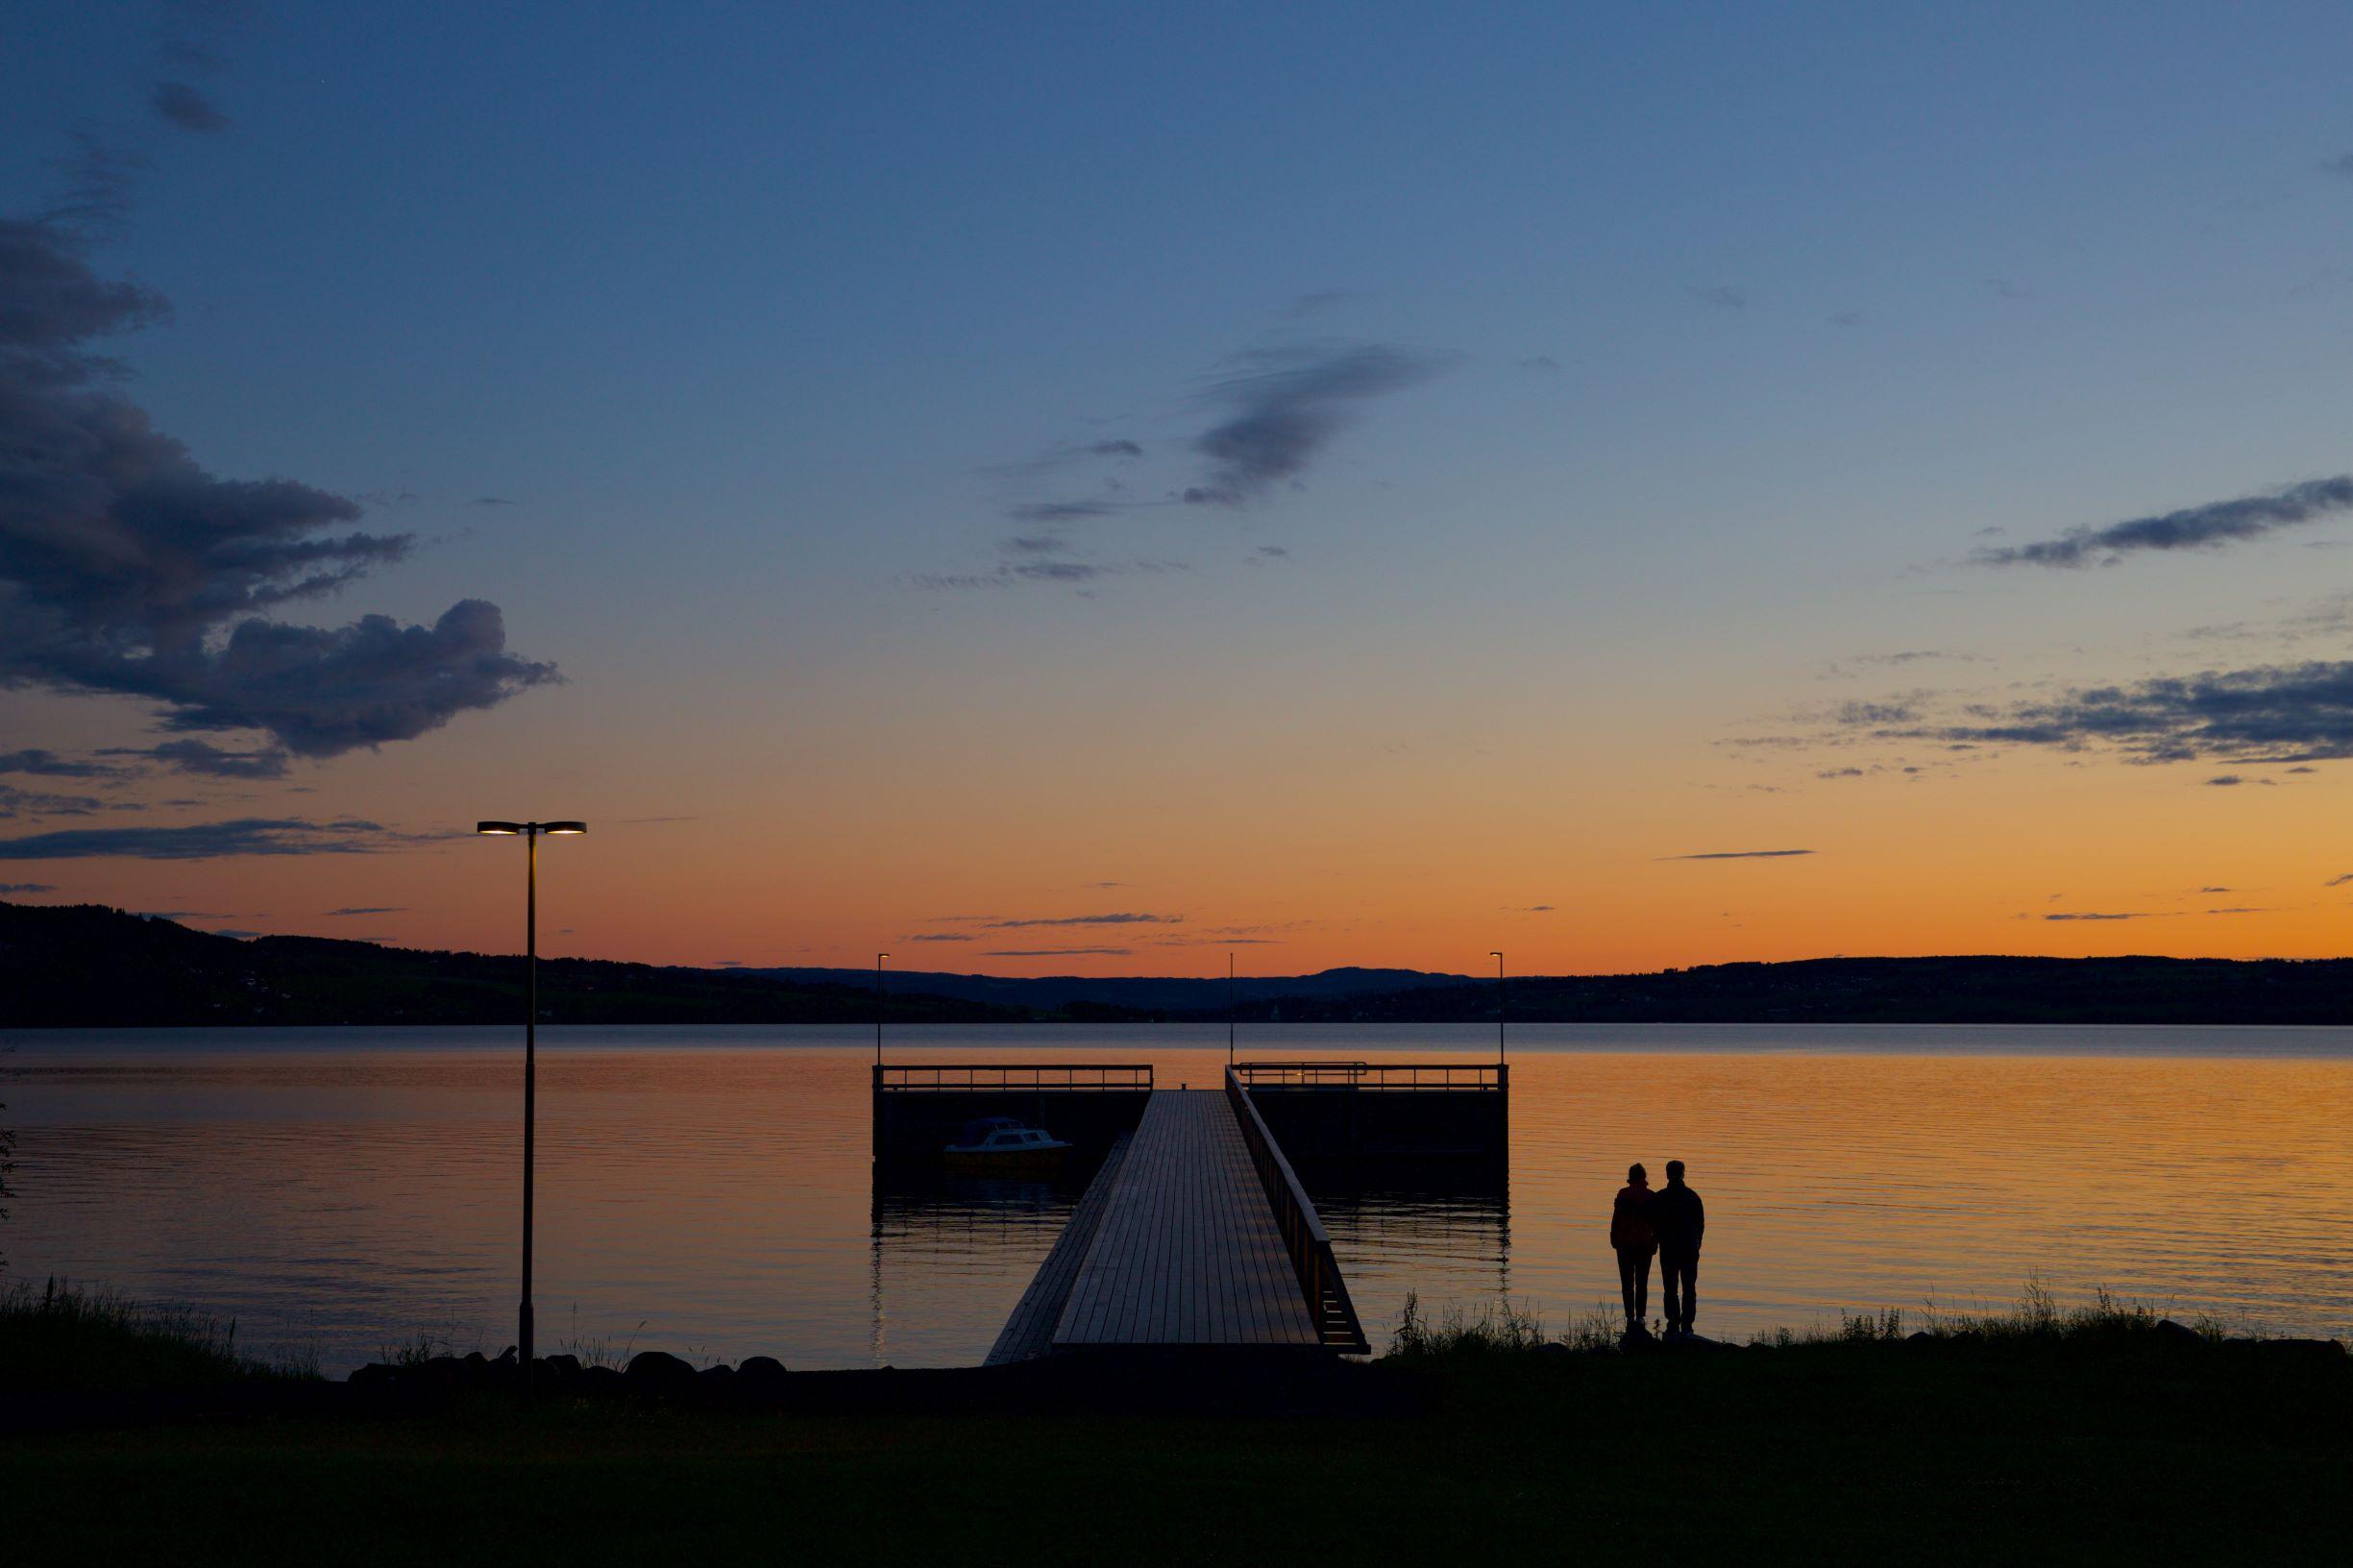 Atlungstad brygge solnedgang